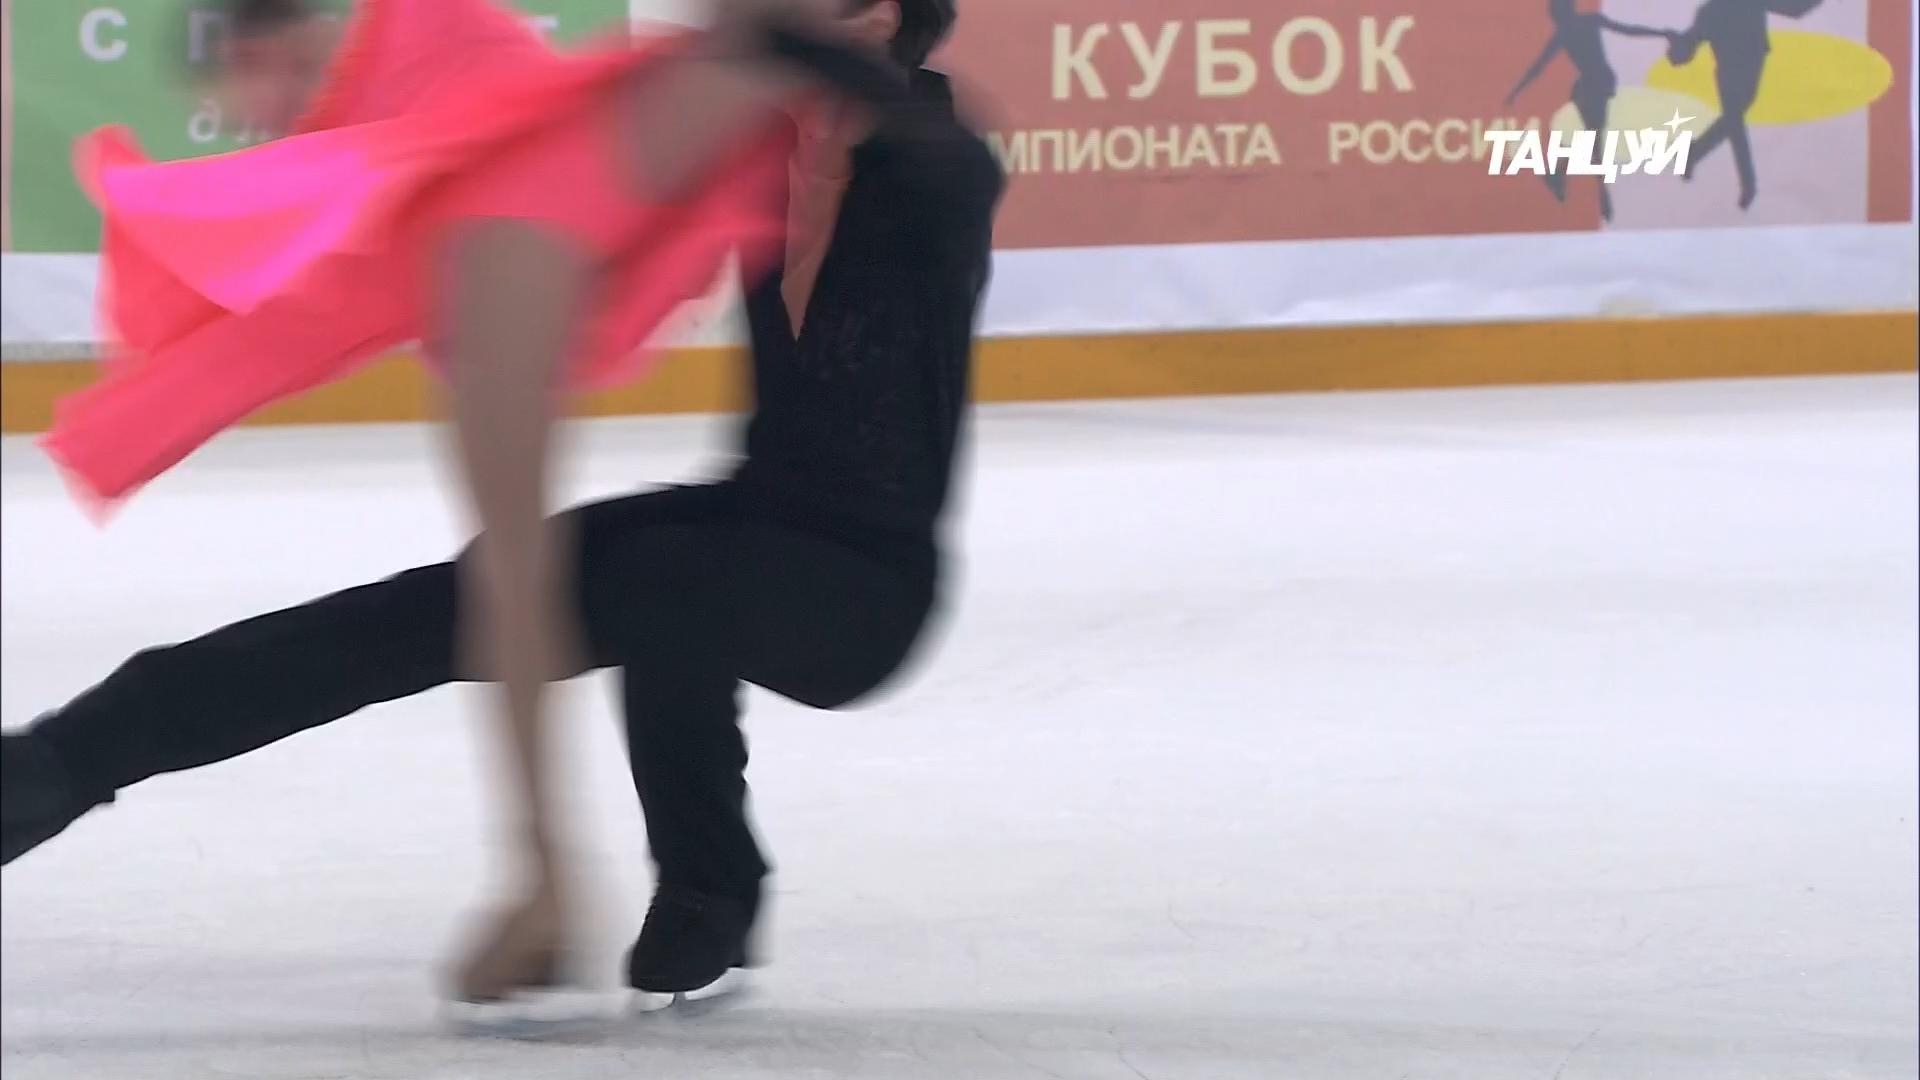 Ксения Роменкова. Жаркий лёд. 1 серия (2008).ts_snapshot_00.03.980.jpg